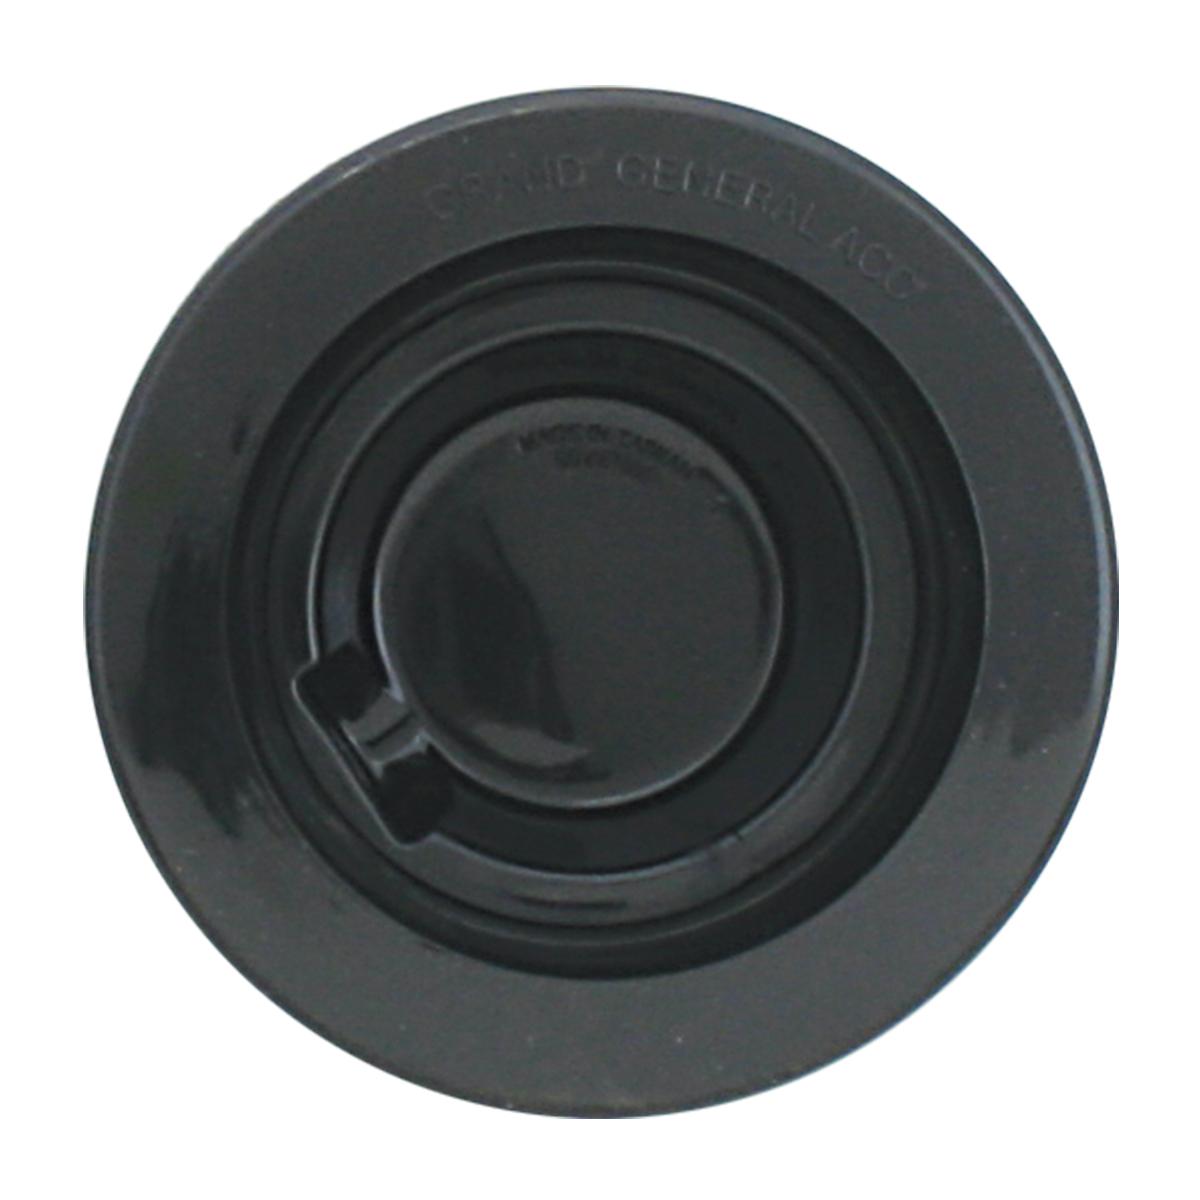 "81005 2-1/2"" Closed Back Rubberized Vinyl Grommet"